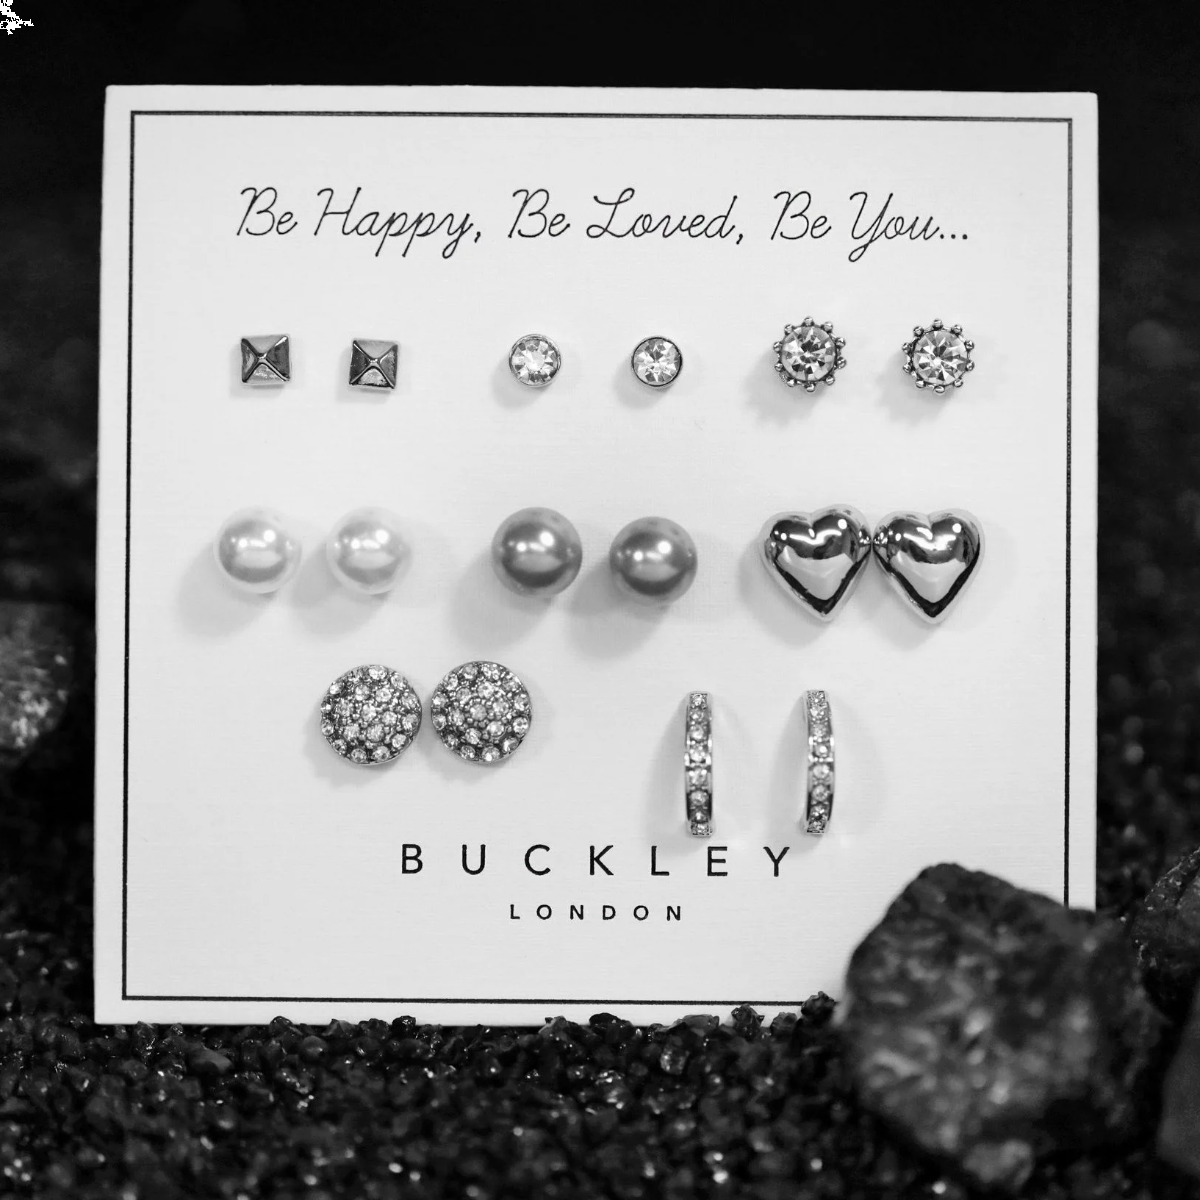 Buckley London Eight Piece Rhodium Earring Set